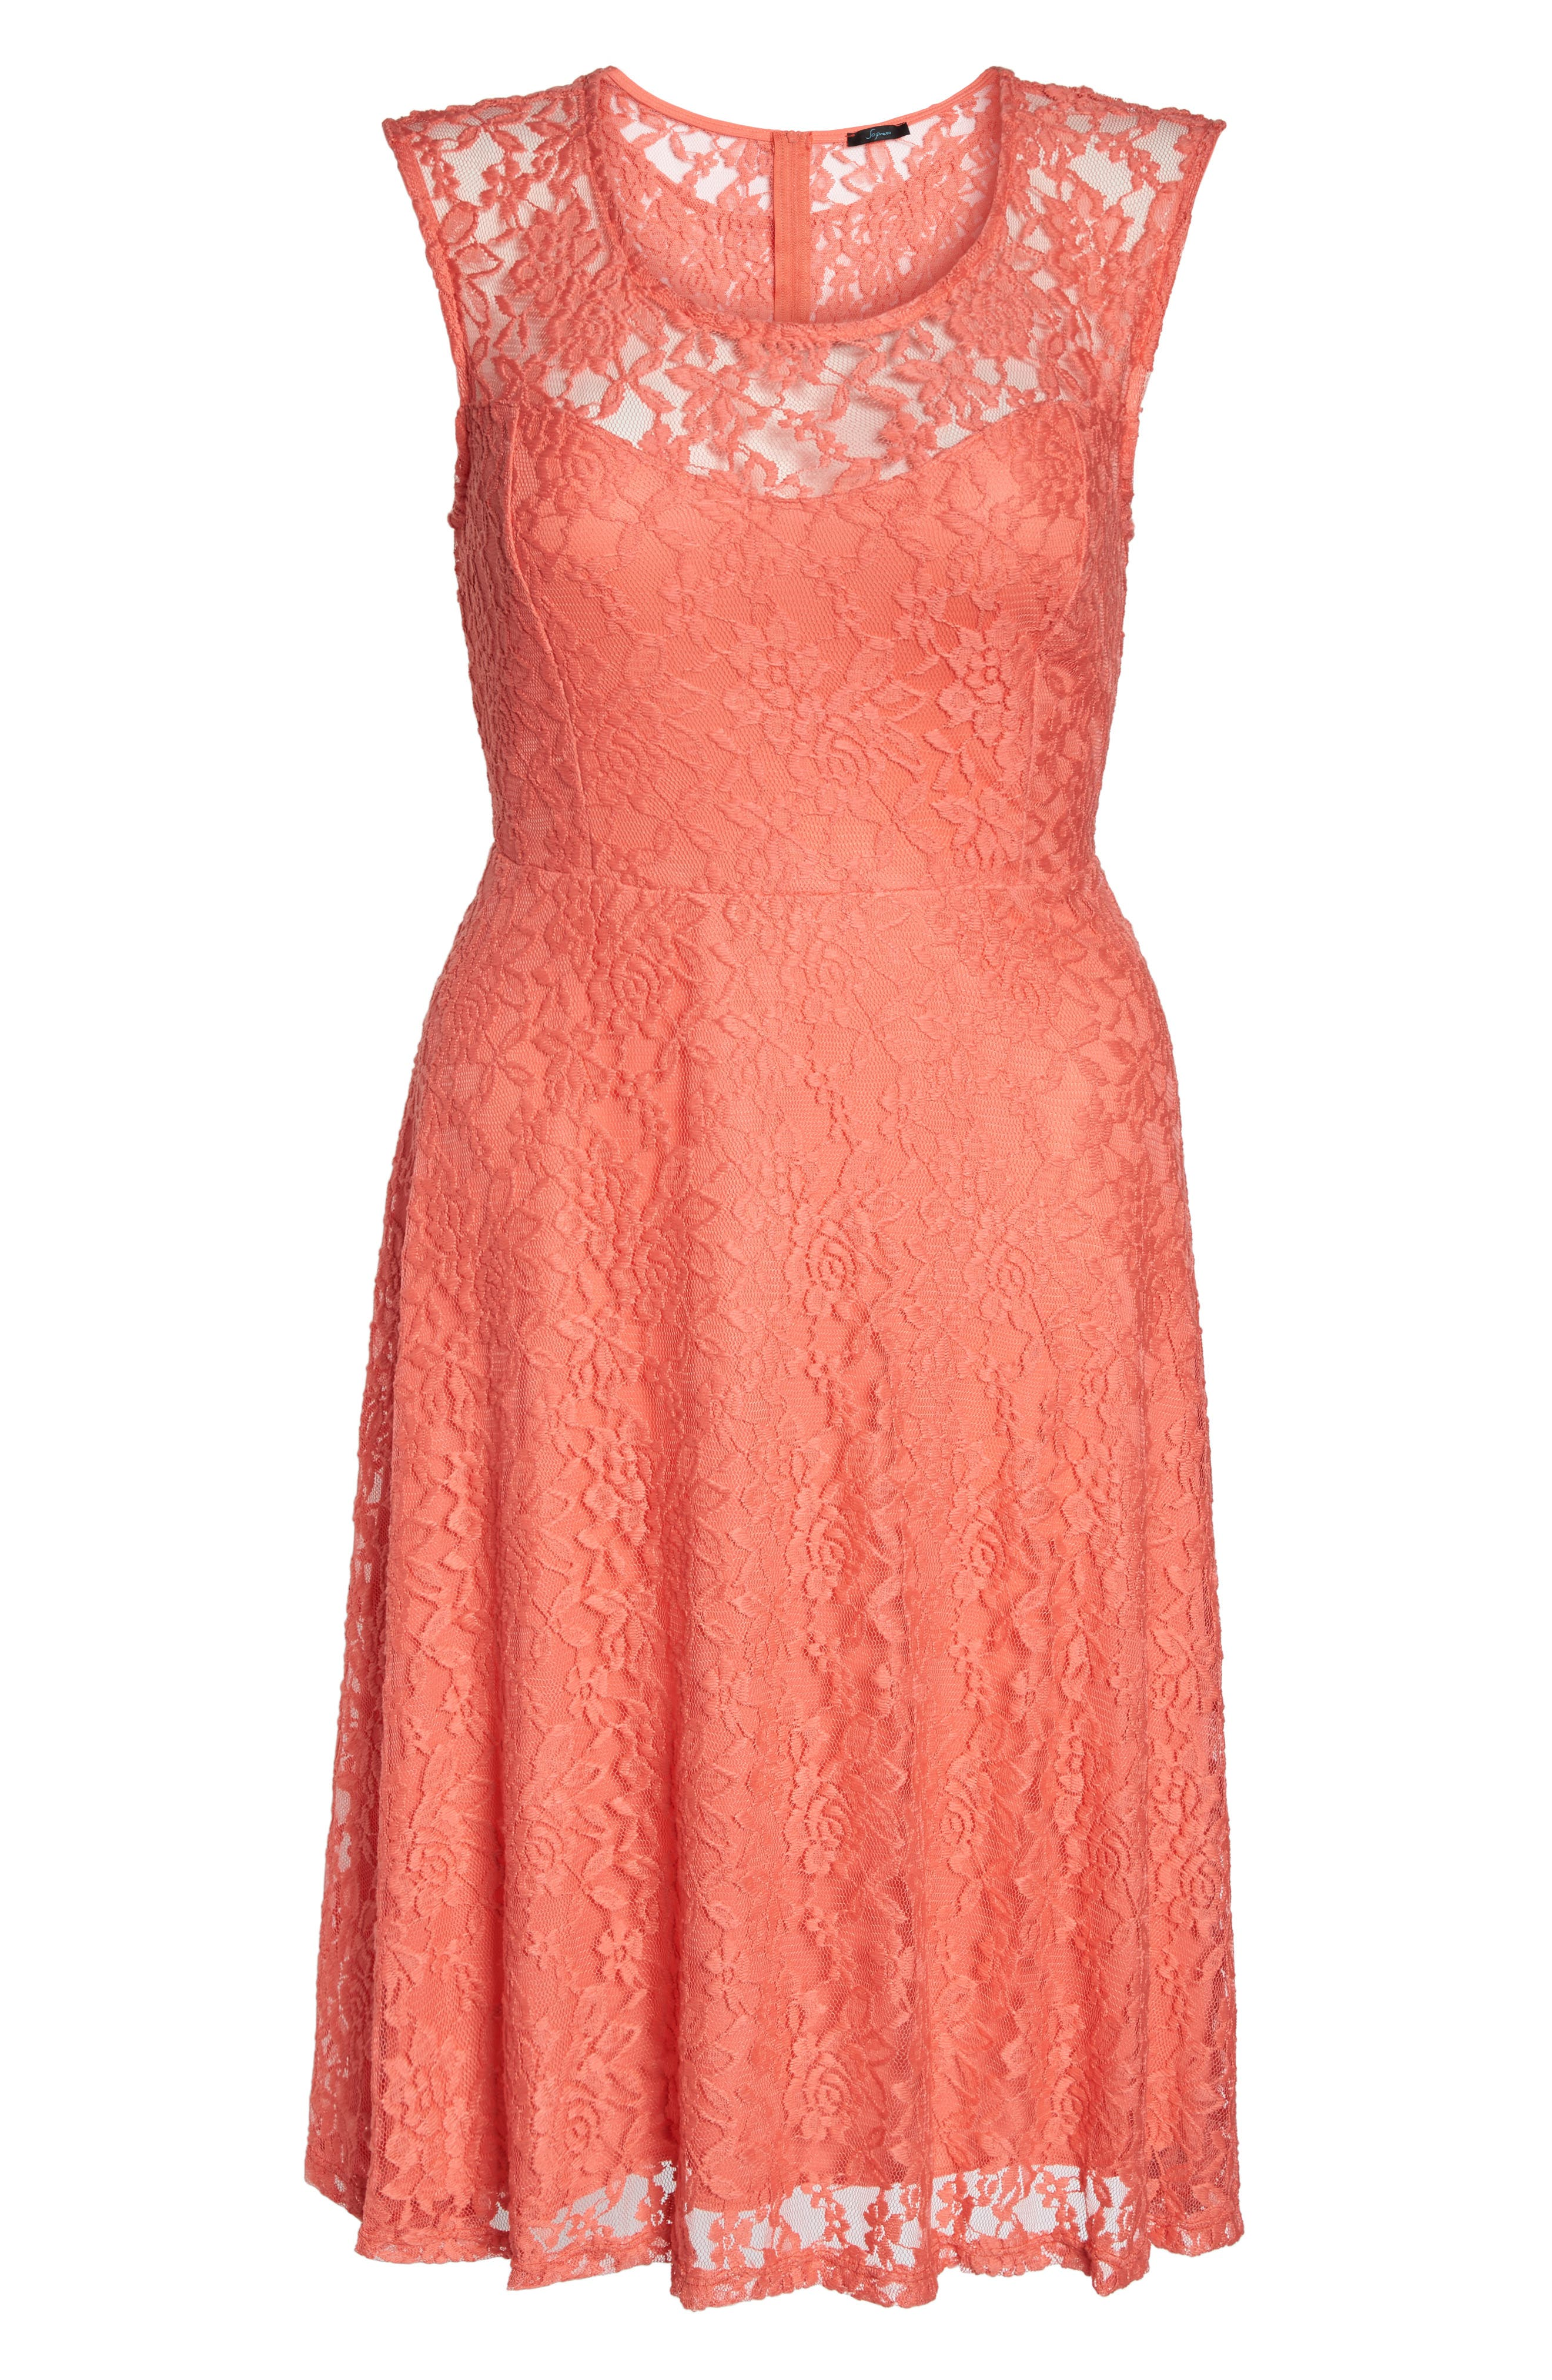 Lace Skater Dress,                             Alternate thumbnail 18, color,